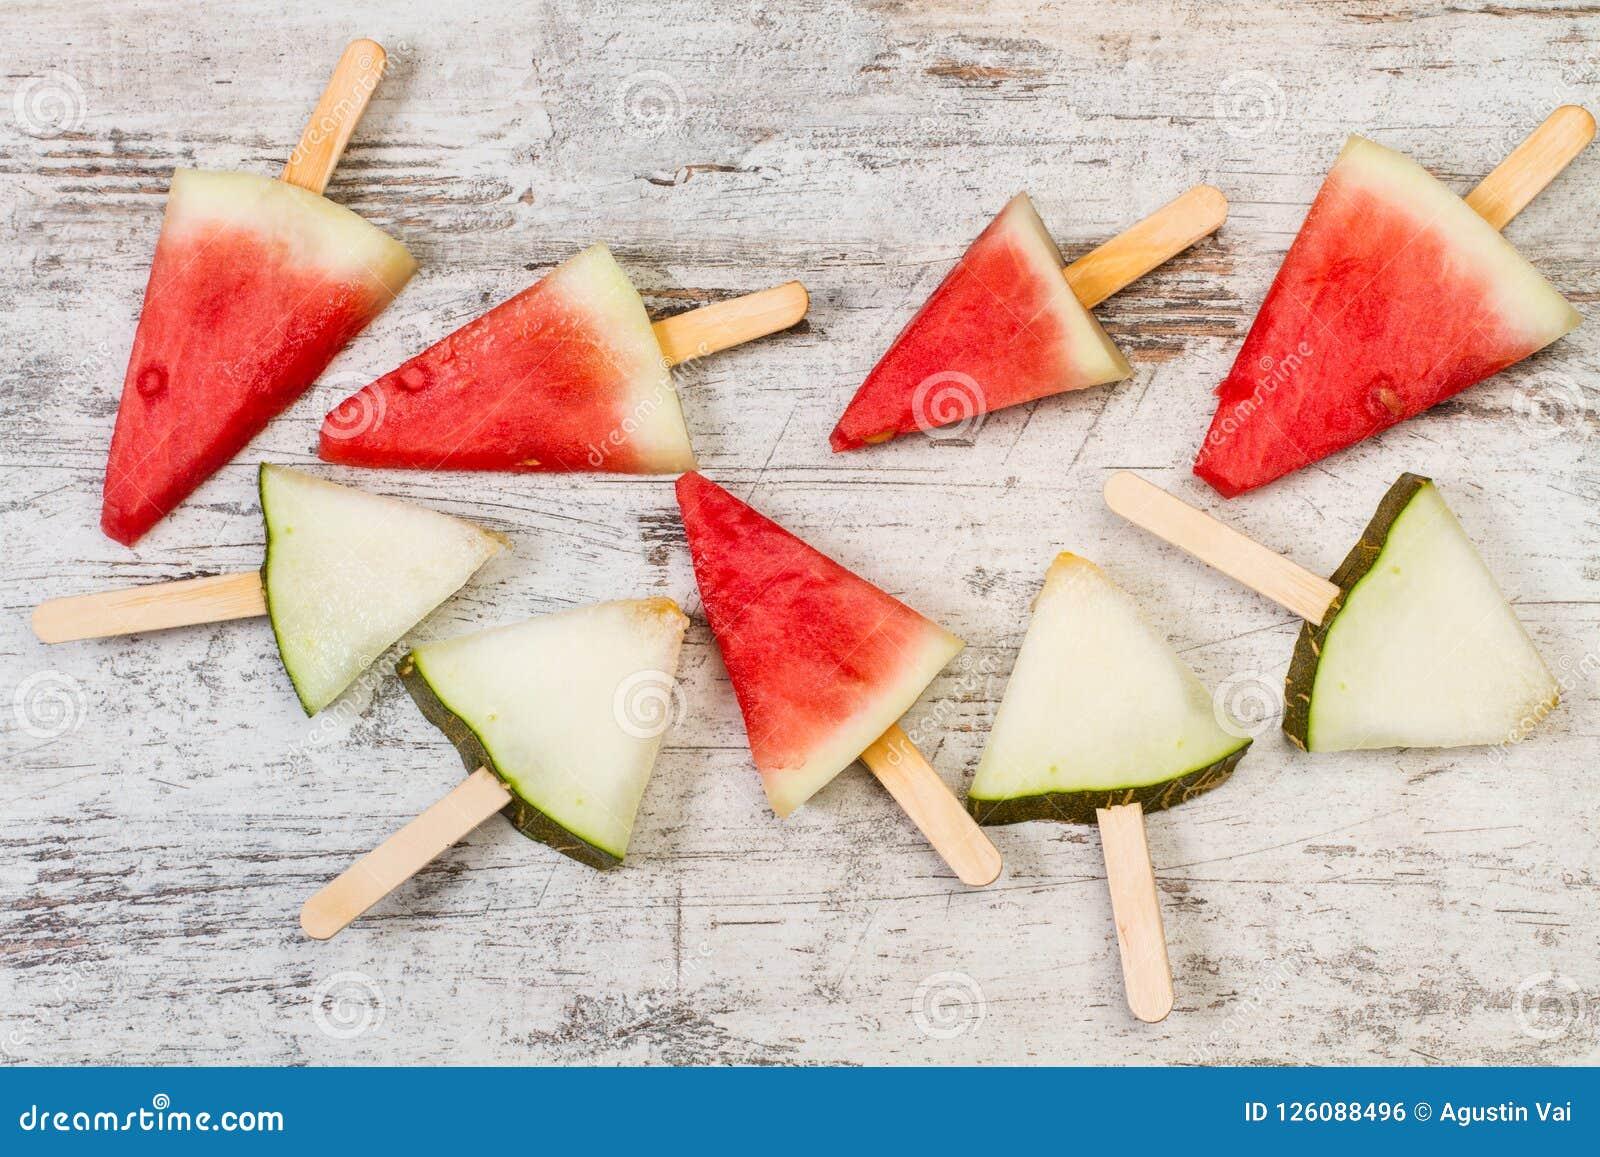 Melon And Watermelon Cut Into Triangles Stock Photo Image